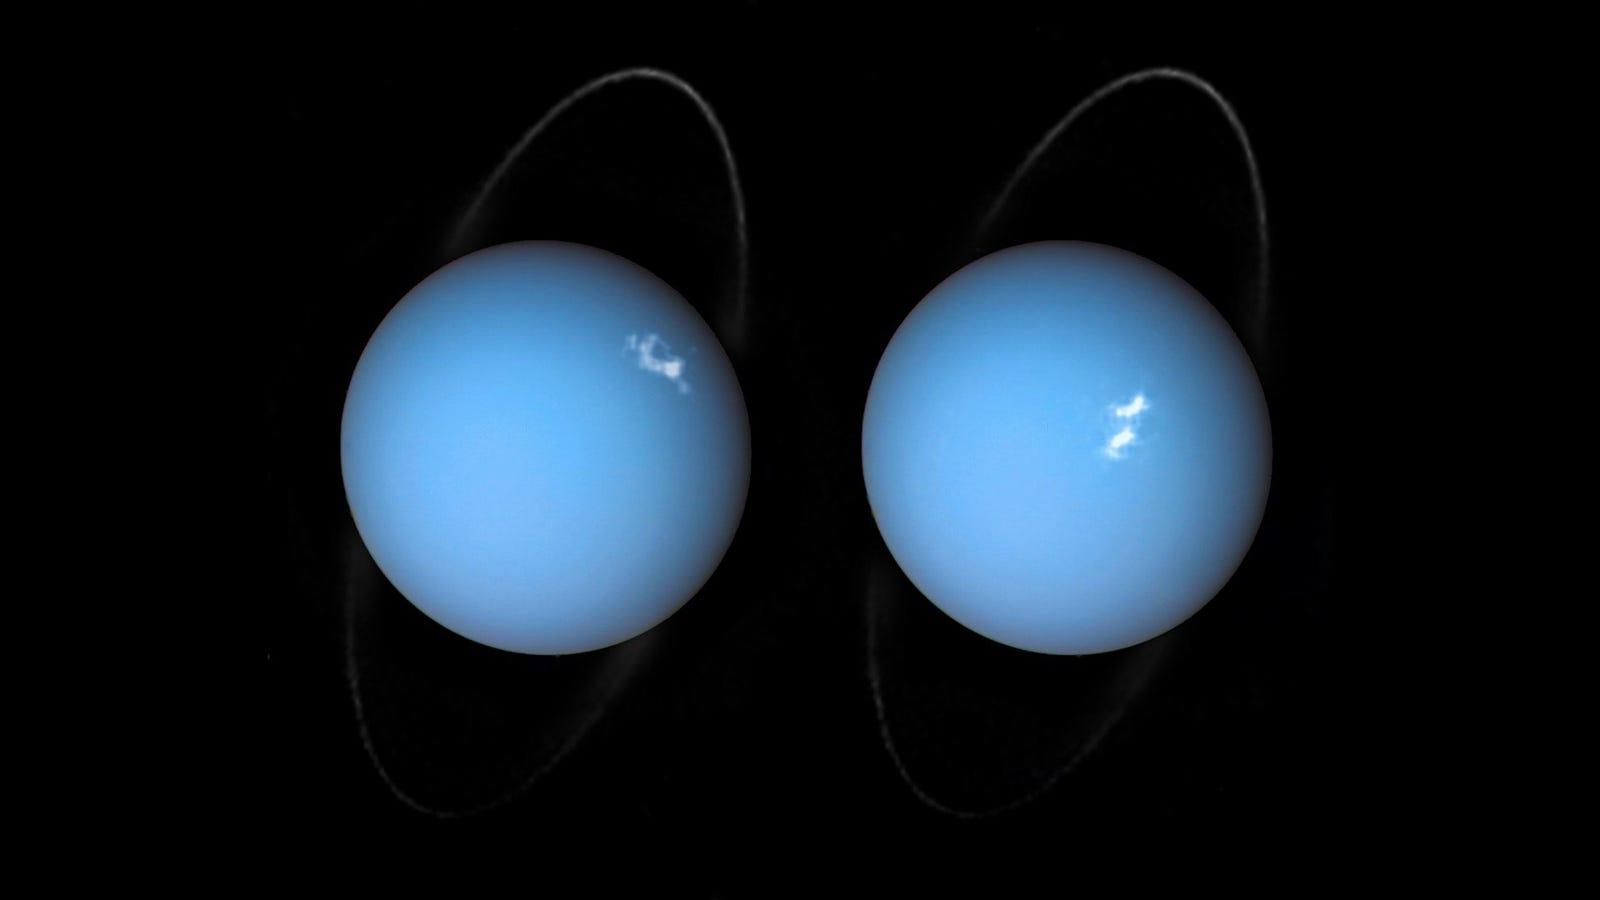 Did Something Massive Smash Into Uranus? LOL